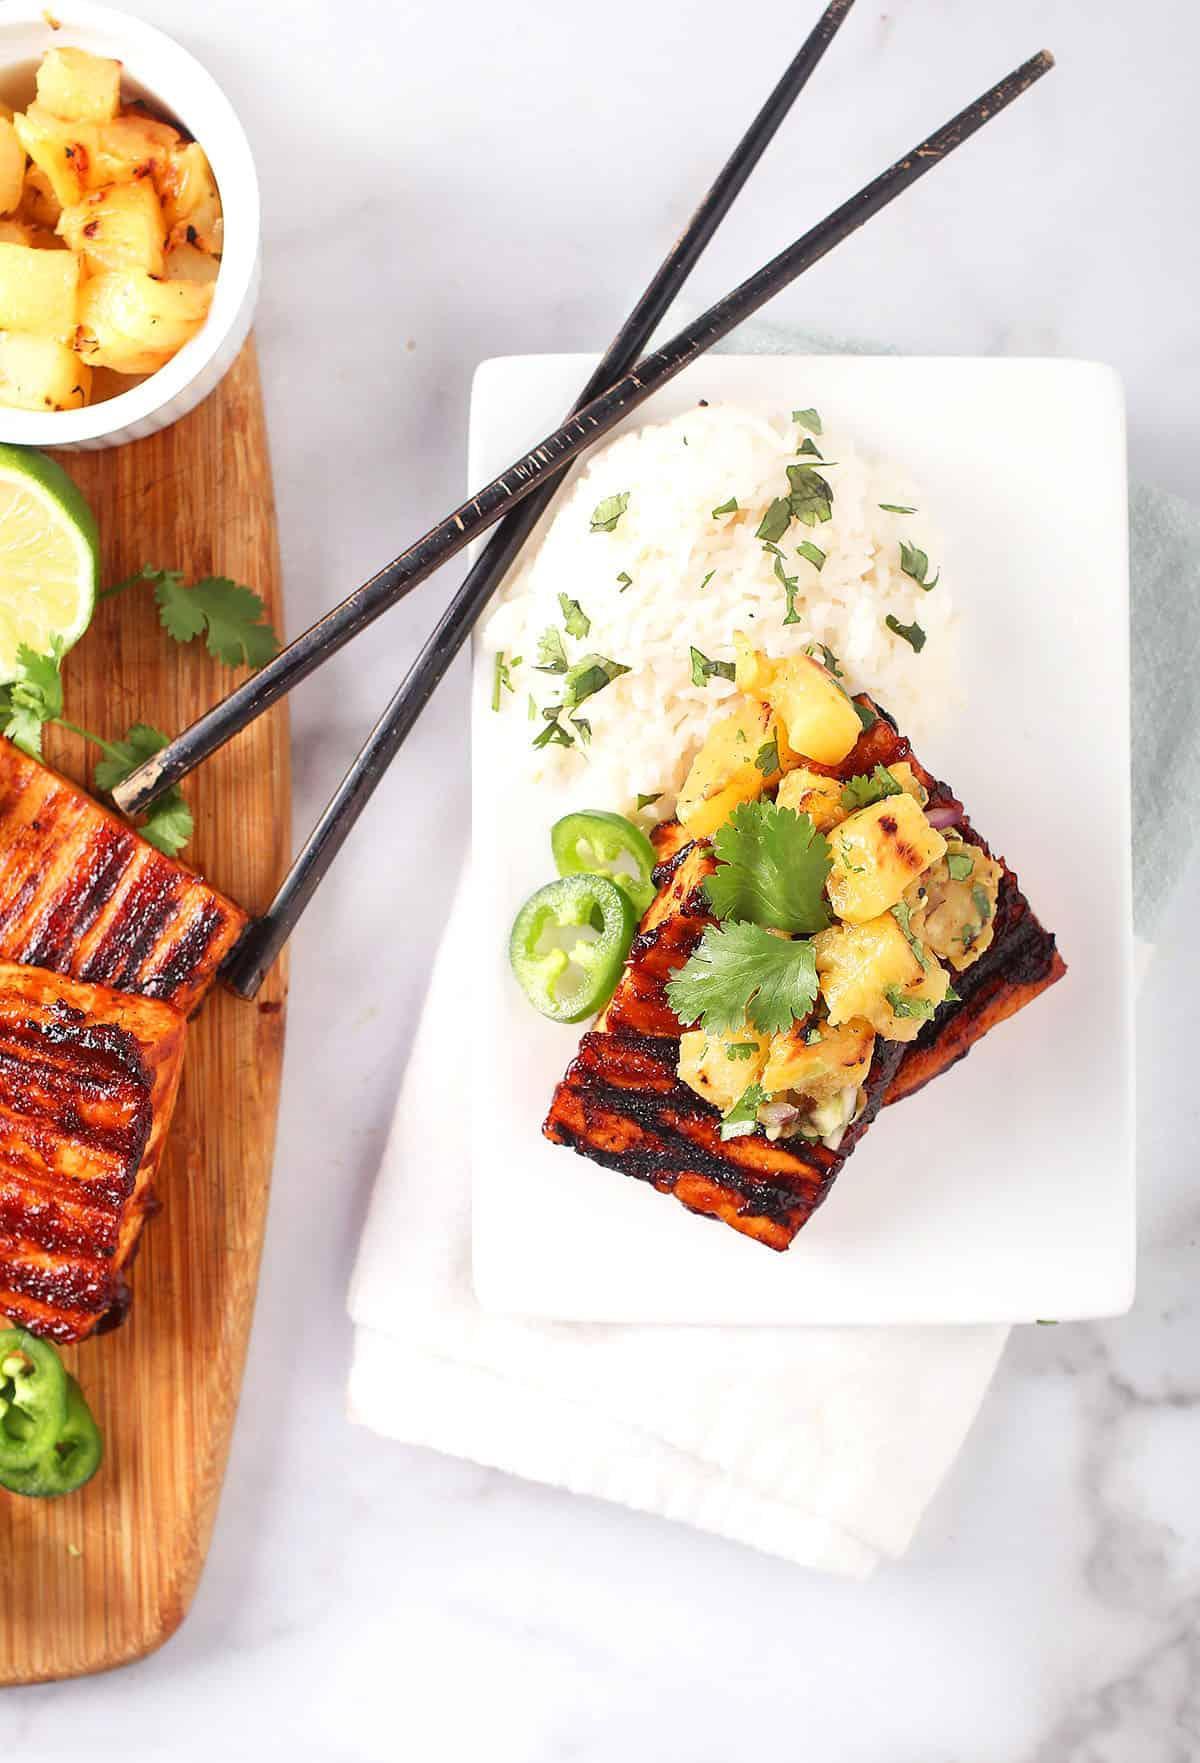 BBQ Tofu Steaks with Pineapple Salsa